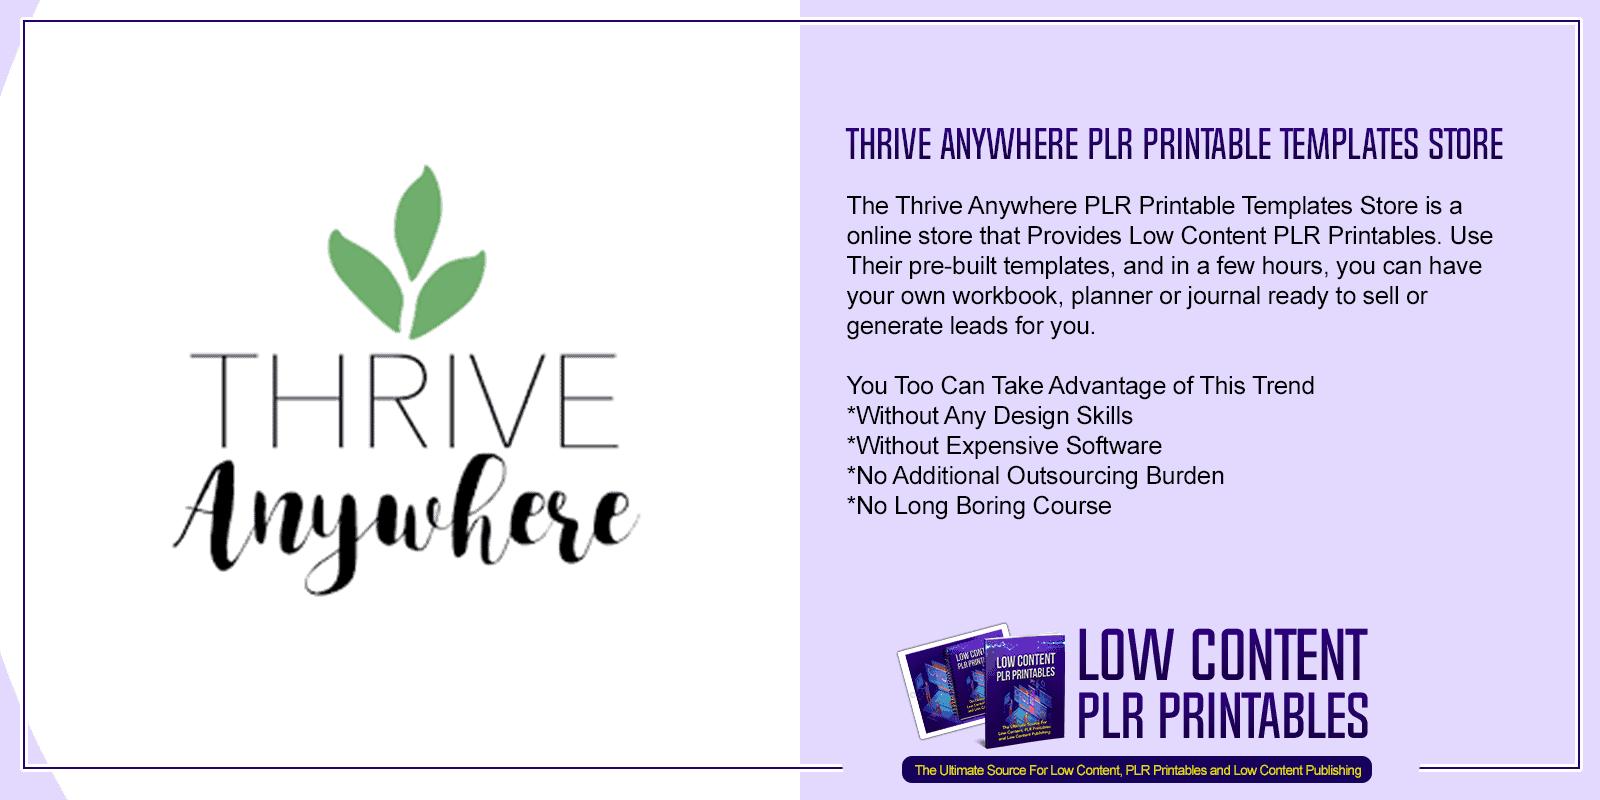 Thrive Anywhere PLR Printable Templates Store